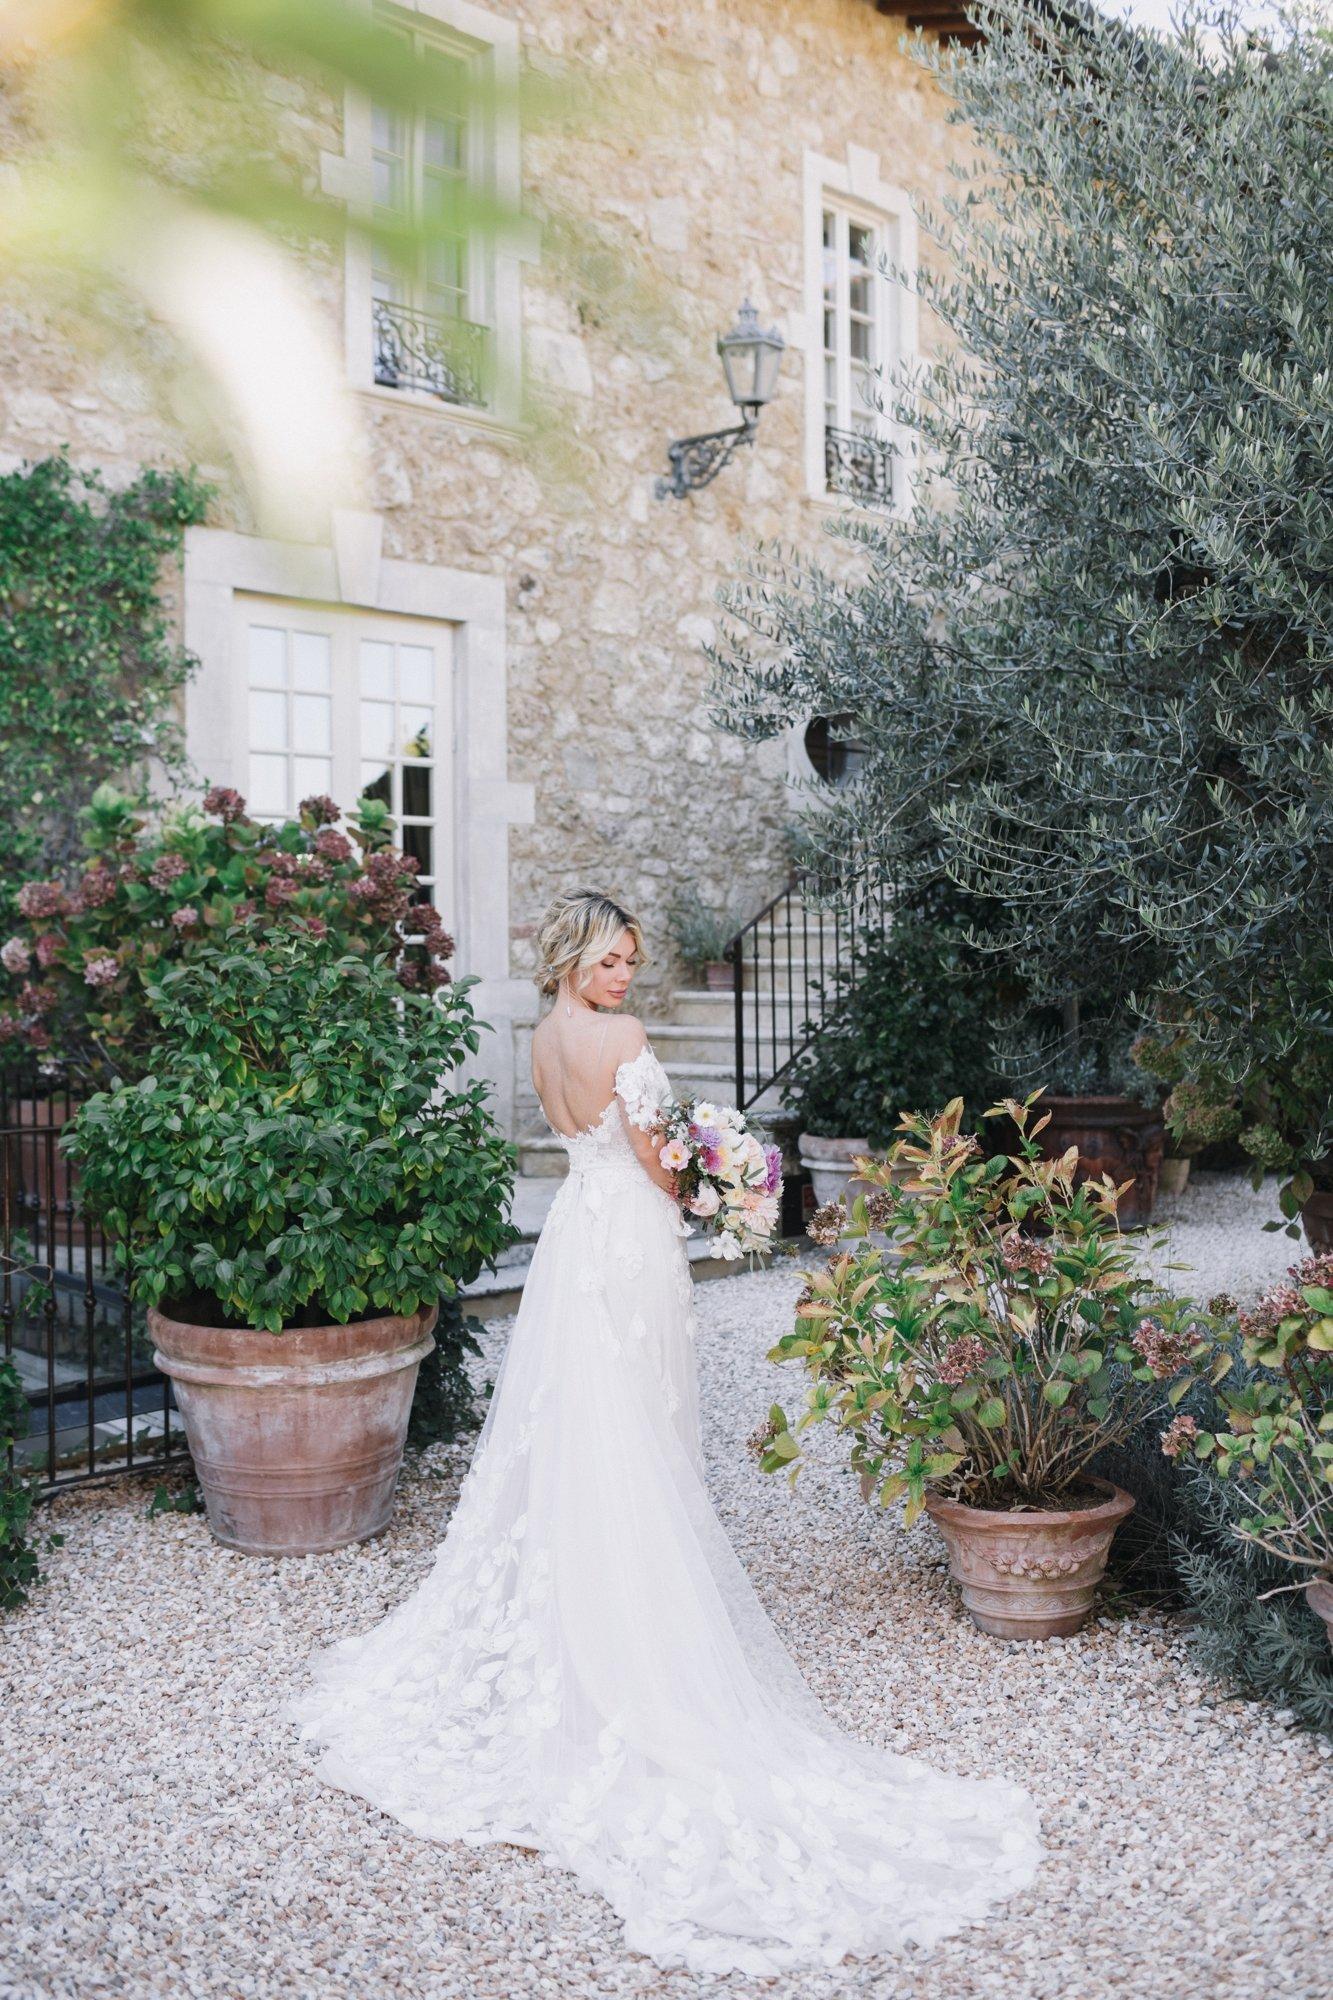 Anastasia Mezhik September 25 2016 Tuscany Italy-All-0122.jpg